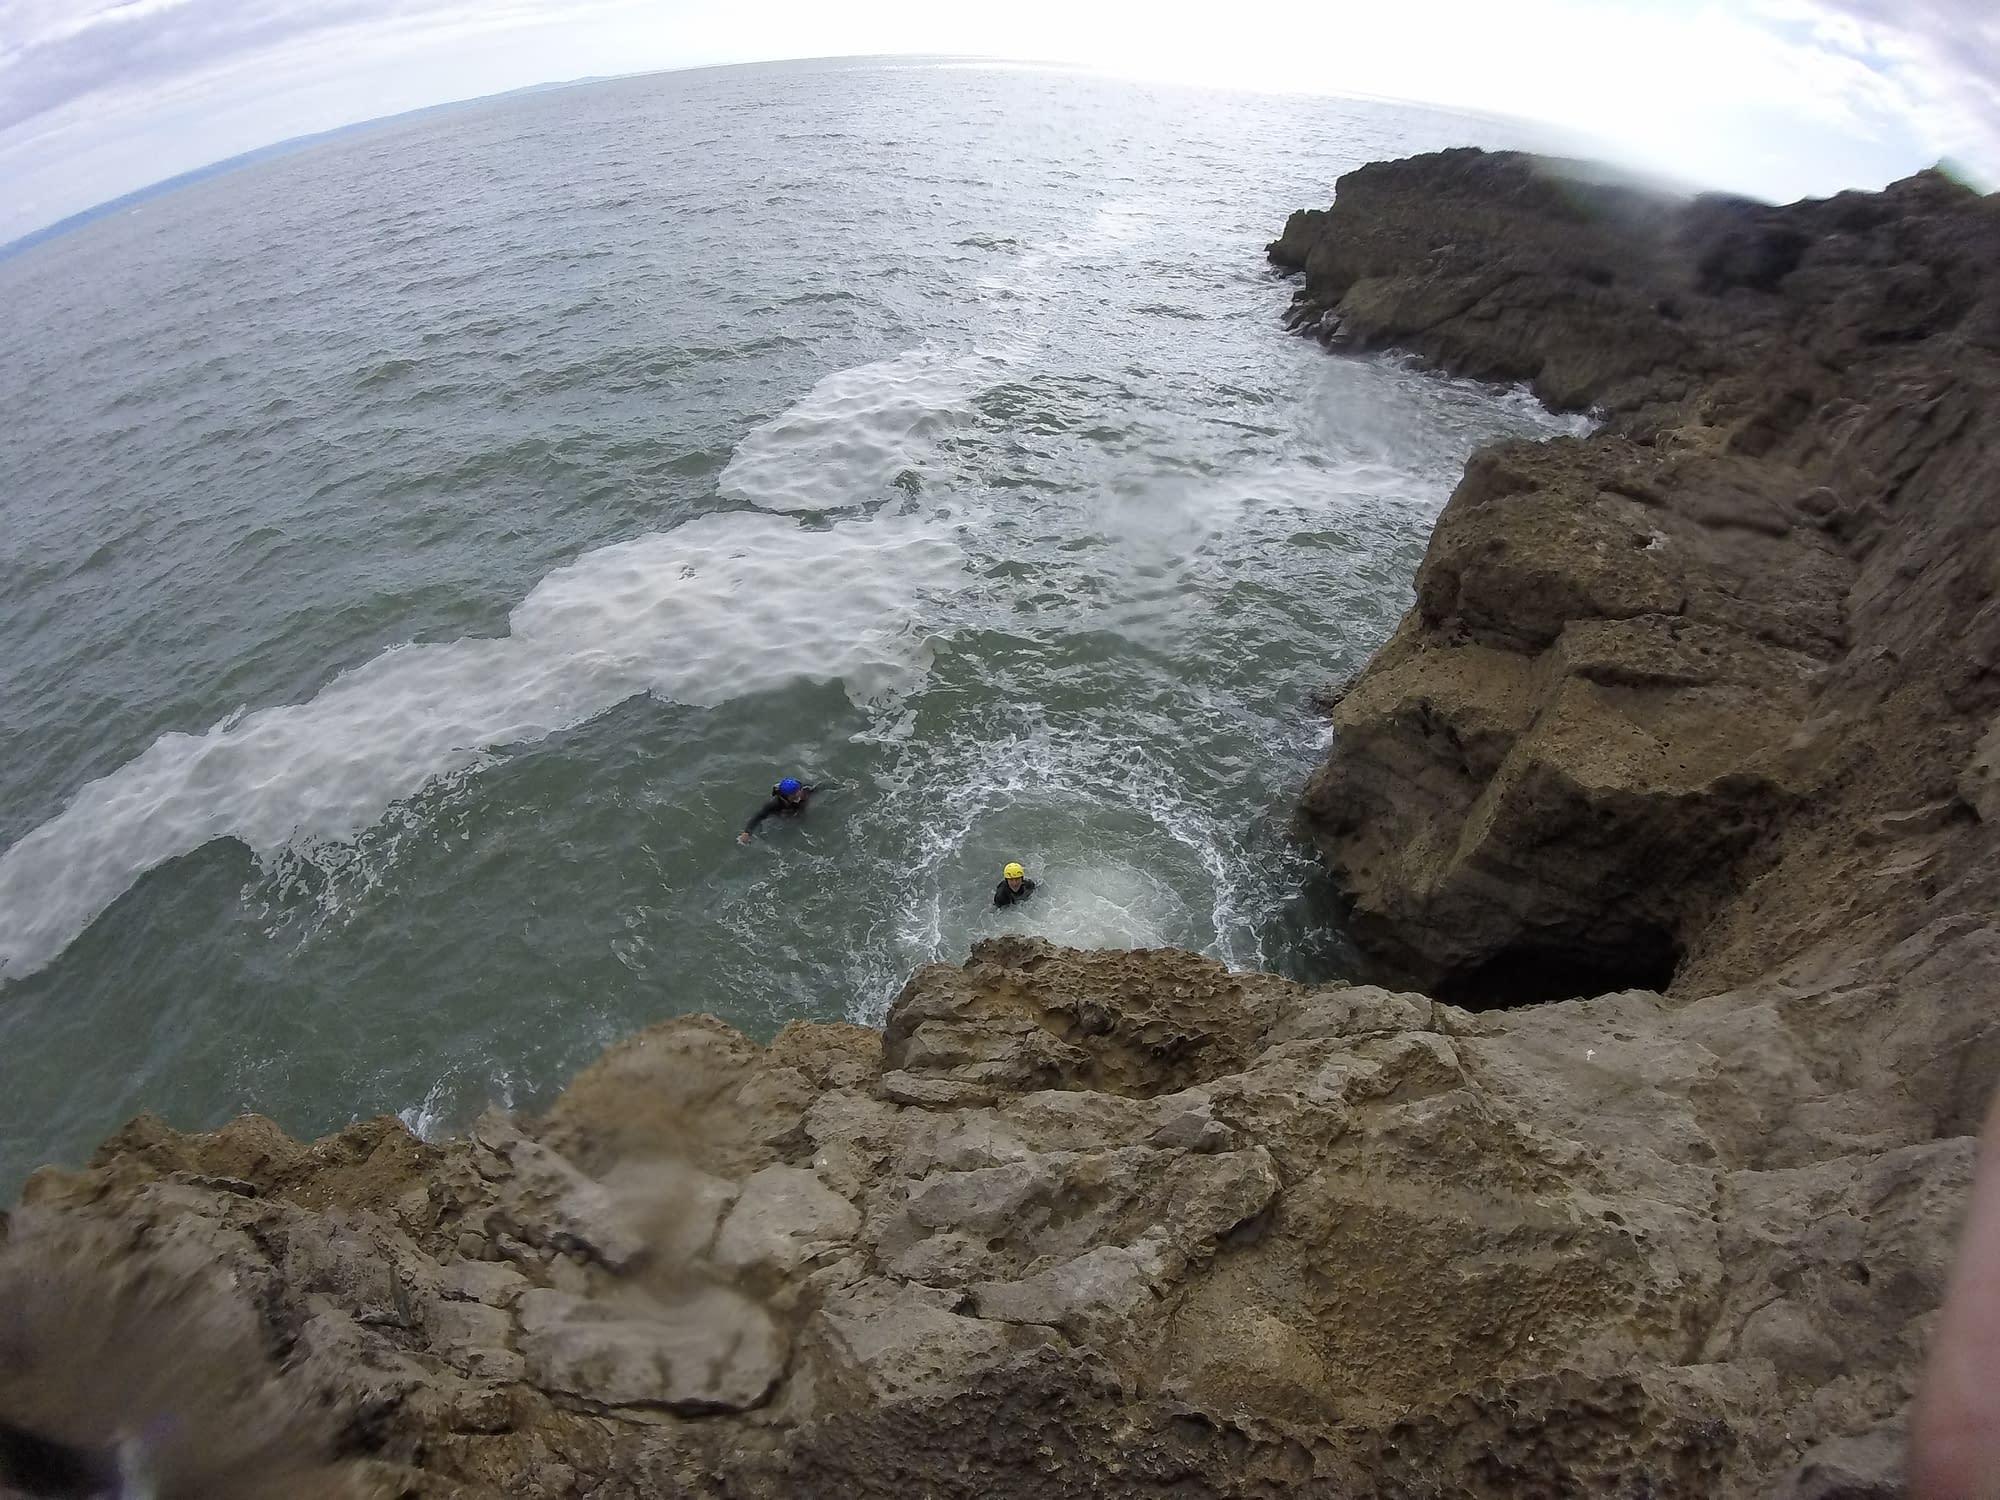 People swimming in sea after big coasteering jump